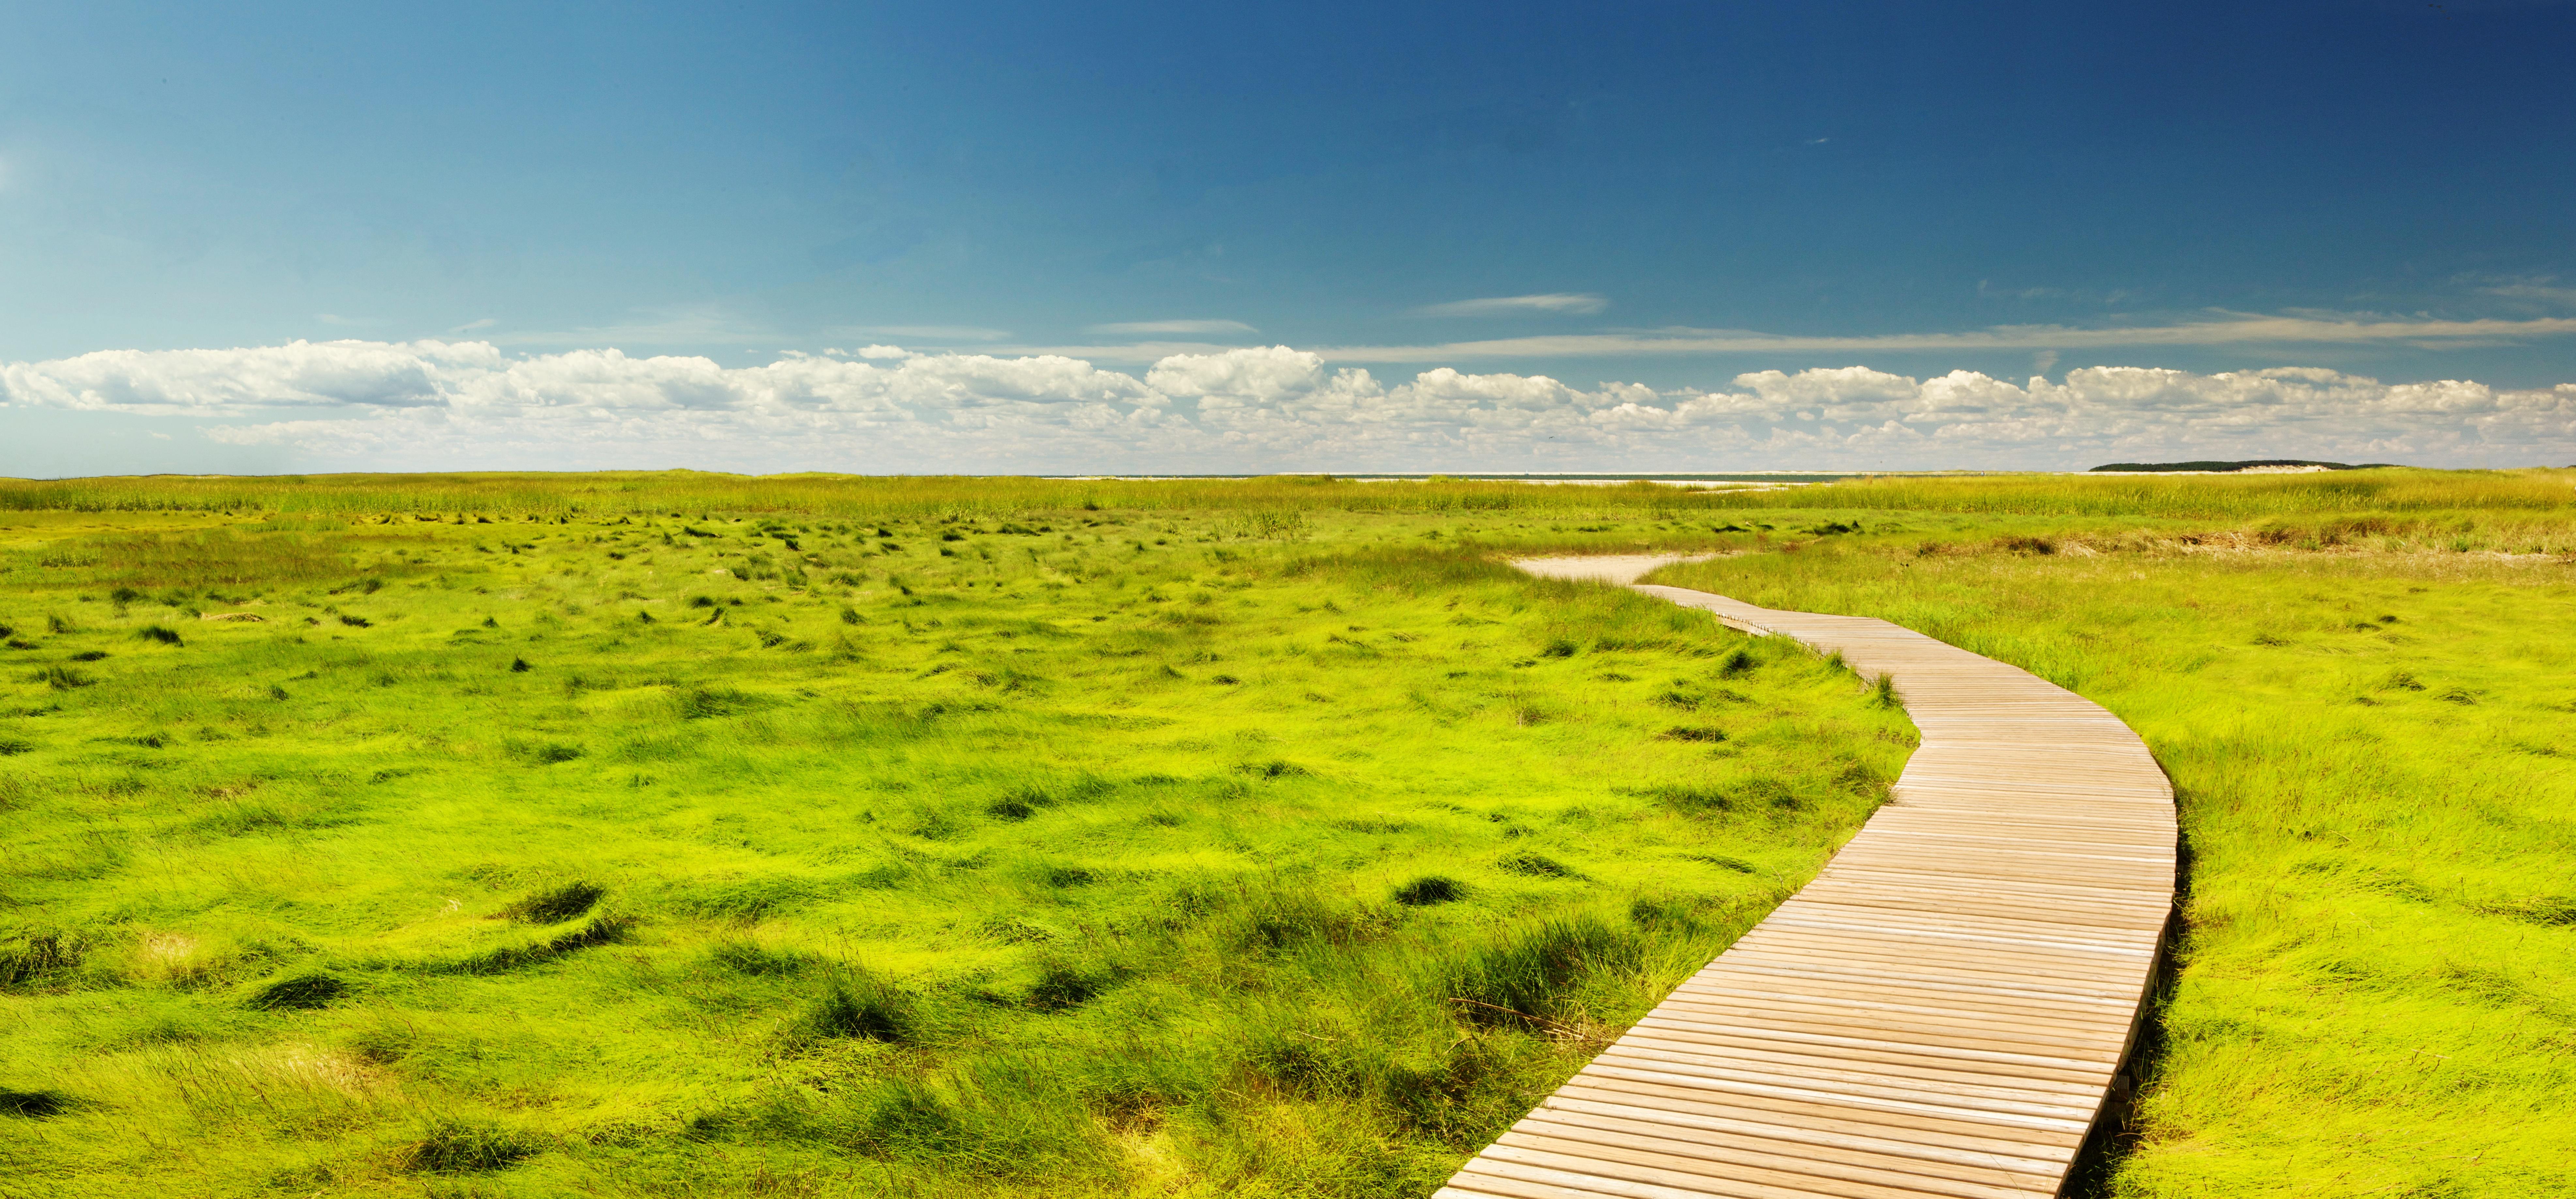 Free Images : landscape, path, pathway, horizon, marsh ...